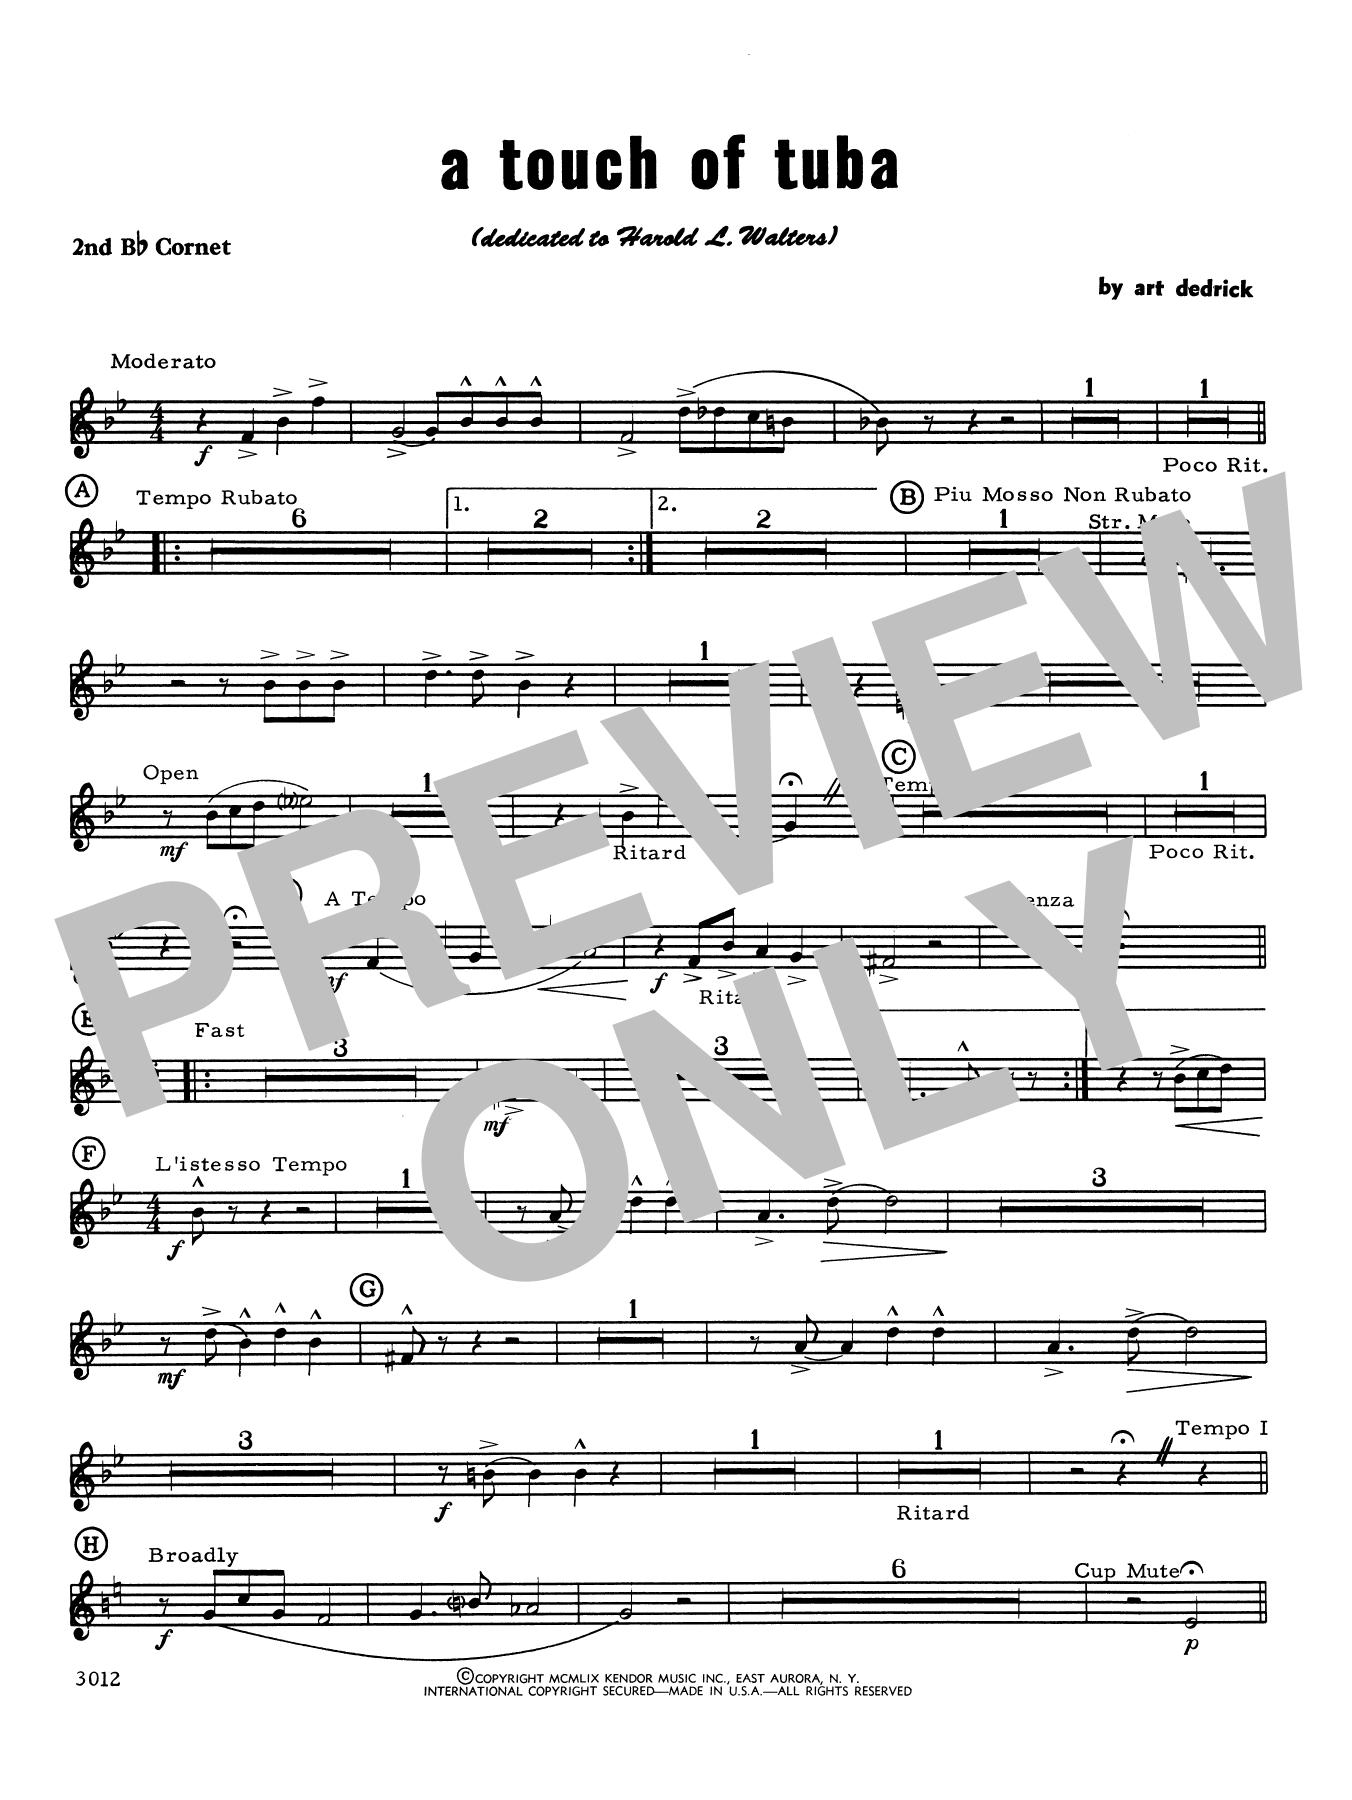 Art Dedrick A Touch Of Tuba - Cornet 2 sheet music notes printable PDF score